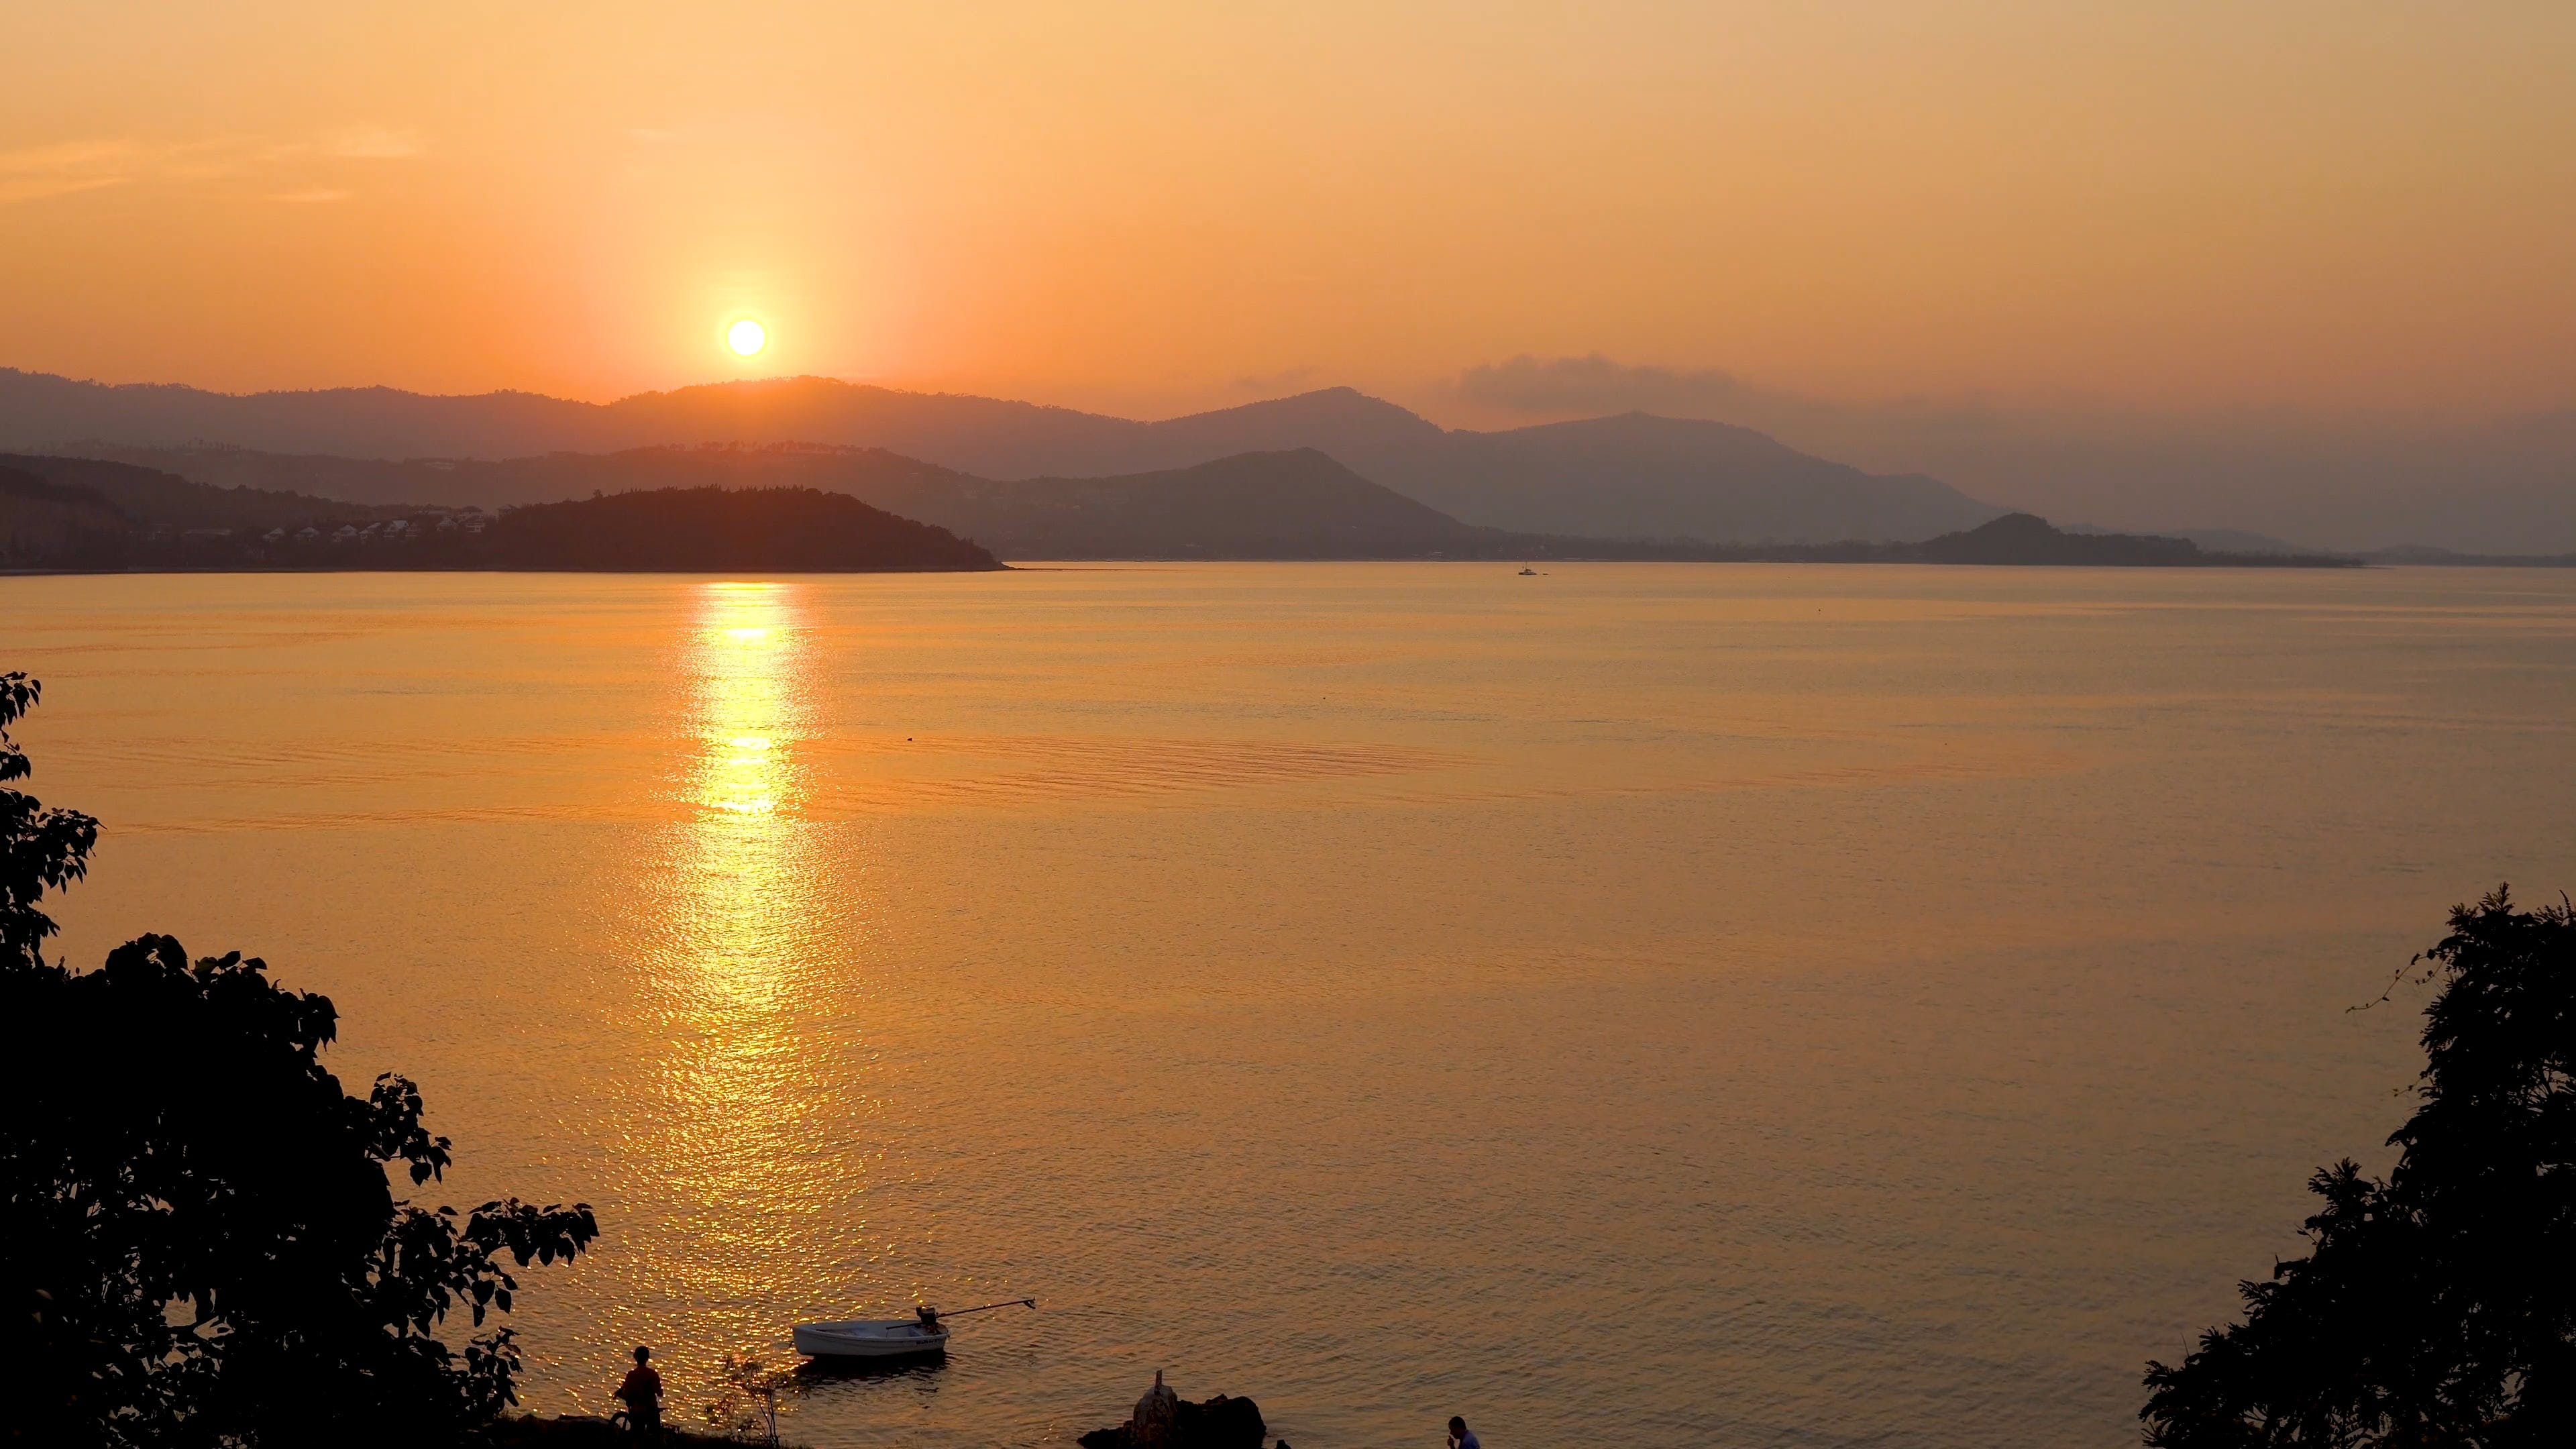 Sunset View On A Lake